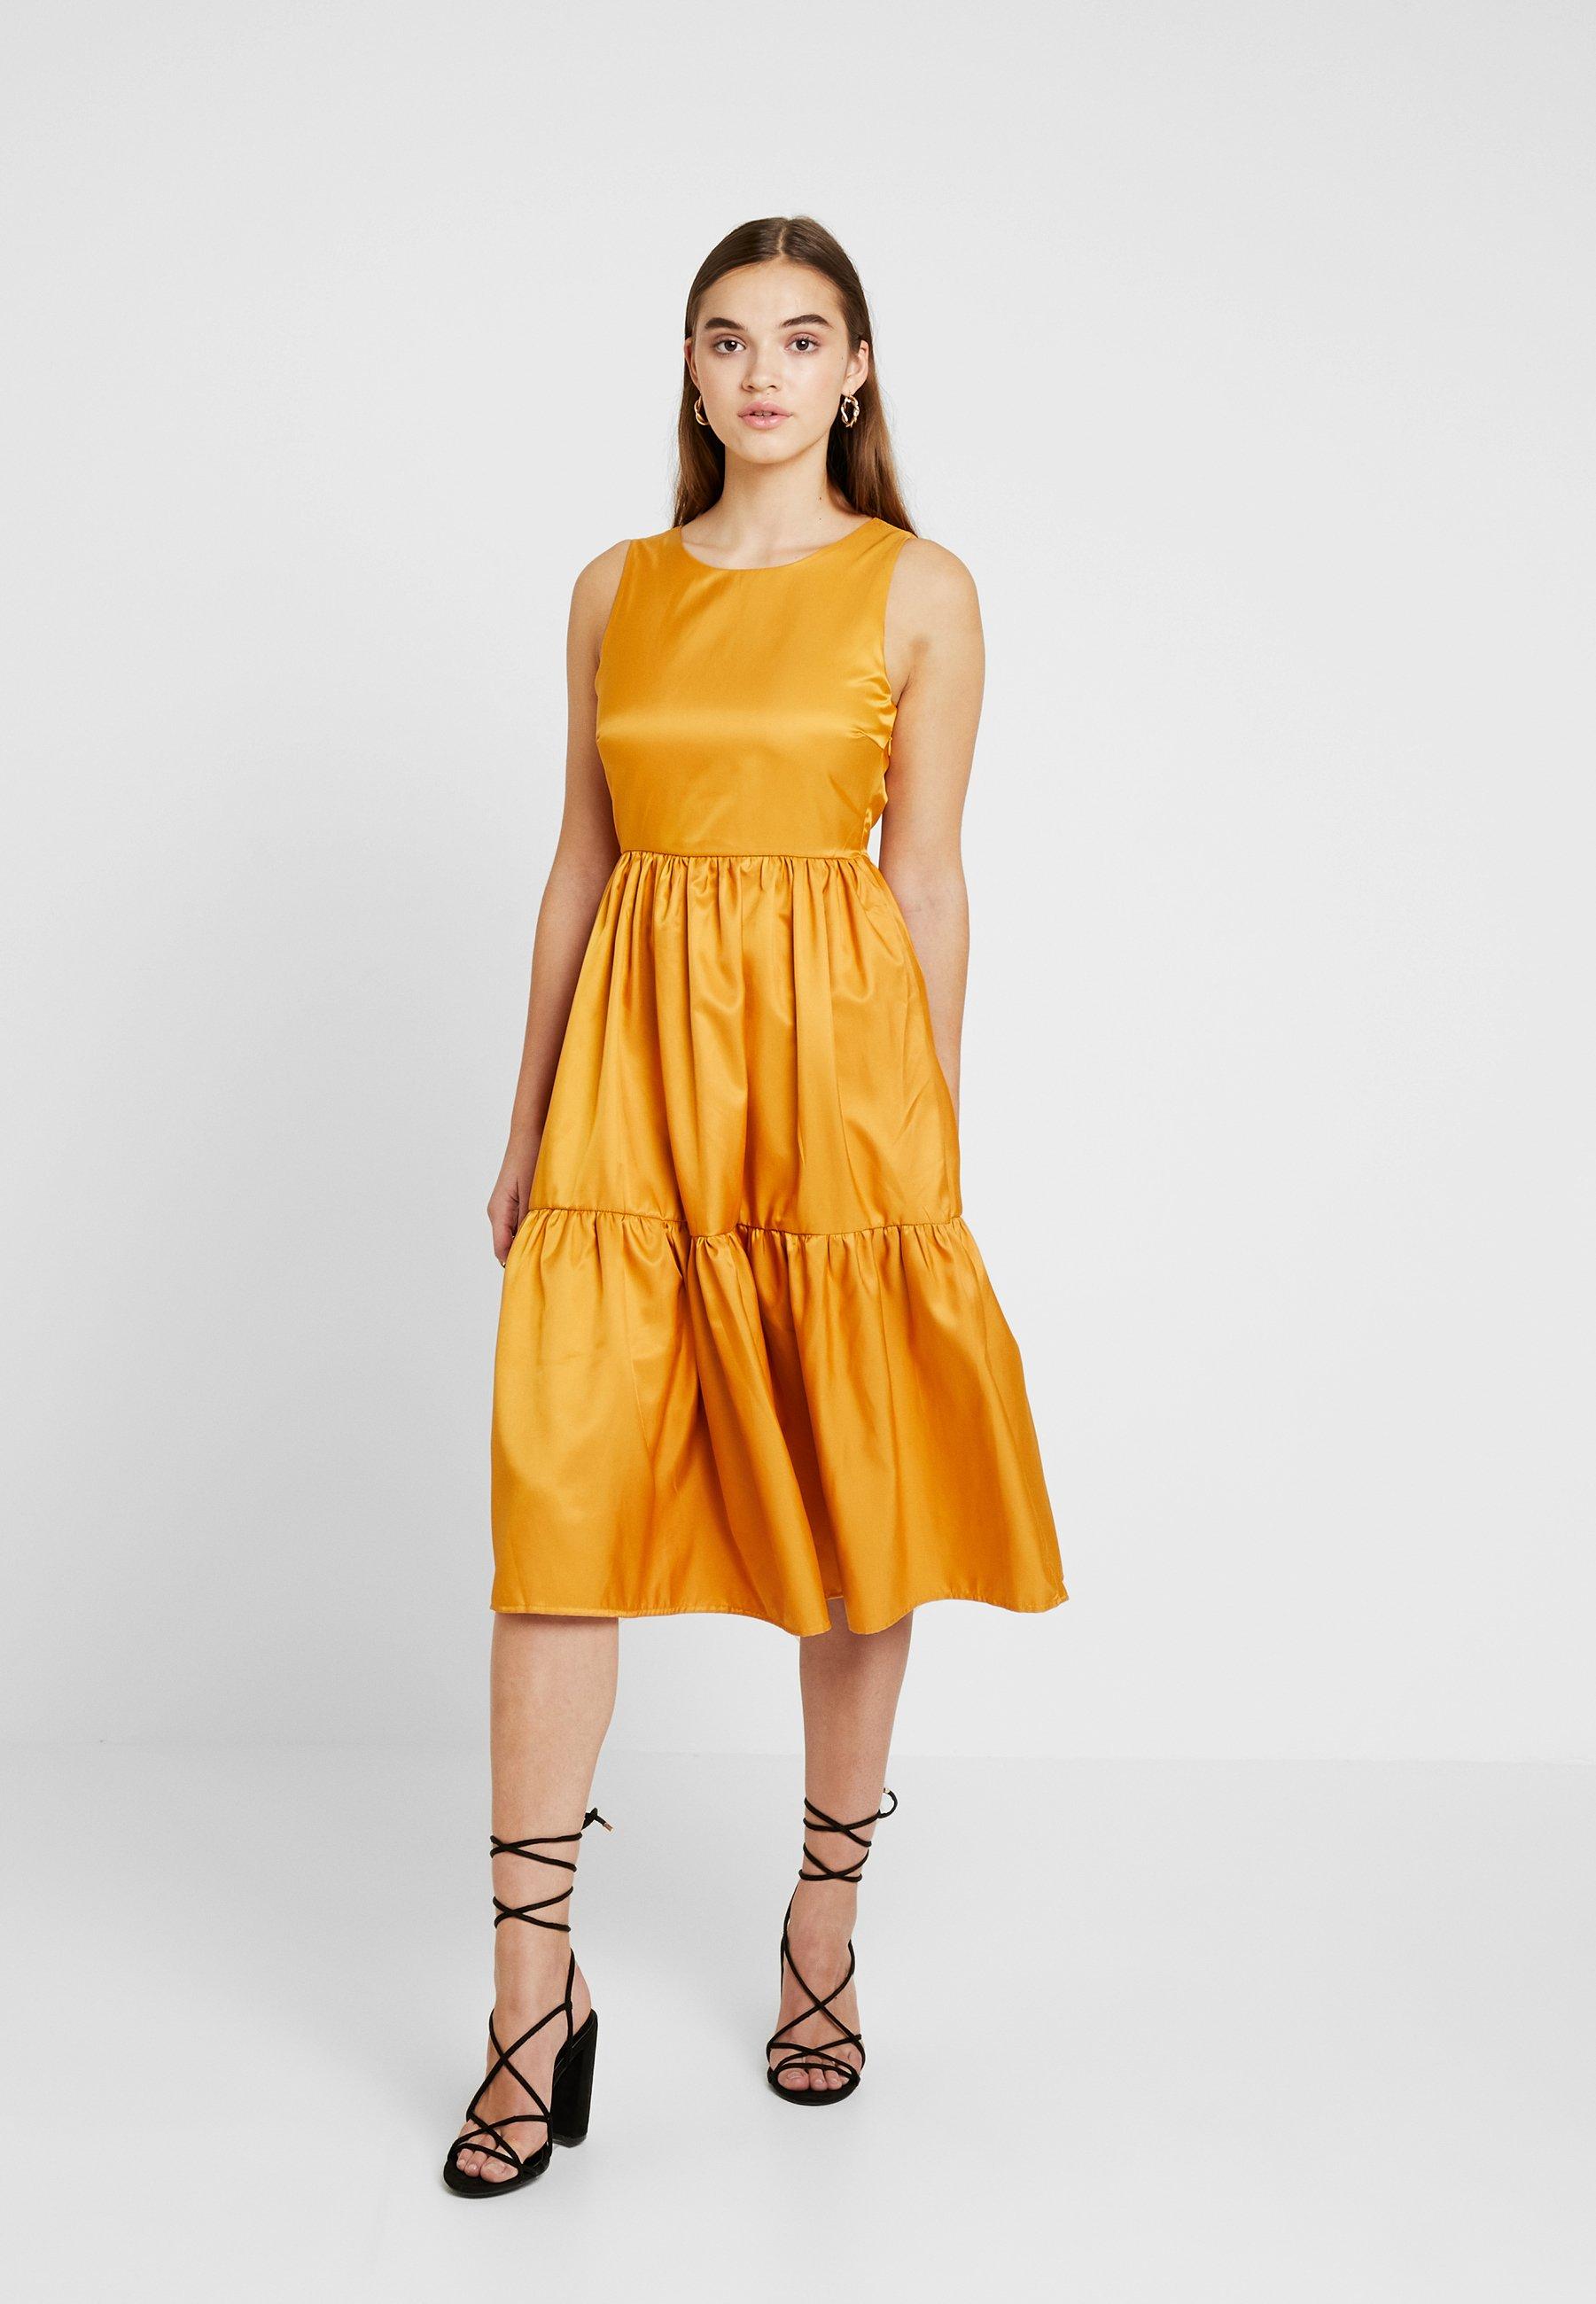 Midi D'été VipRobe Yolk Yellow Dress Yas Yasestelle 5ARSLcj3q4